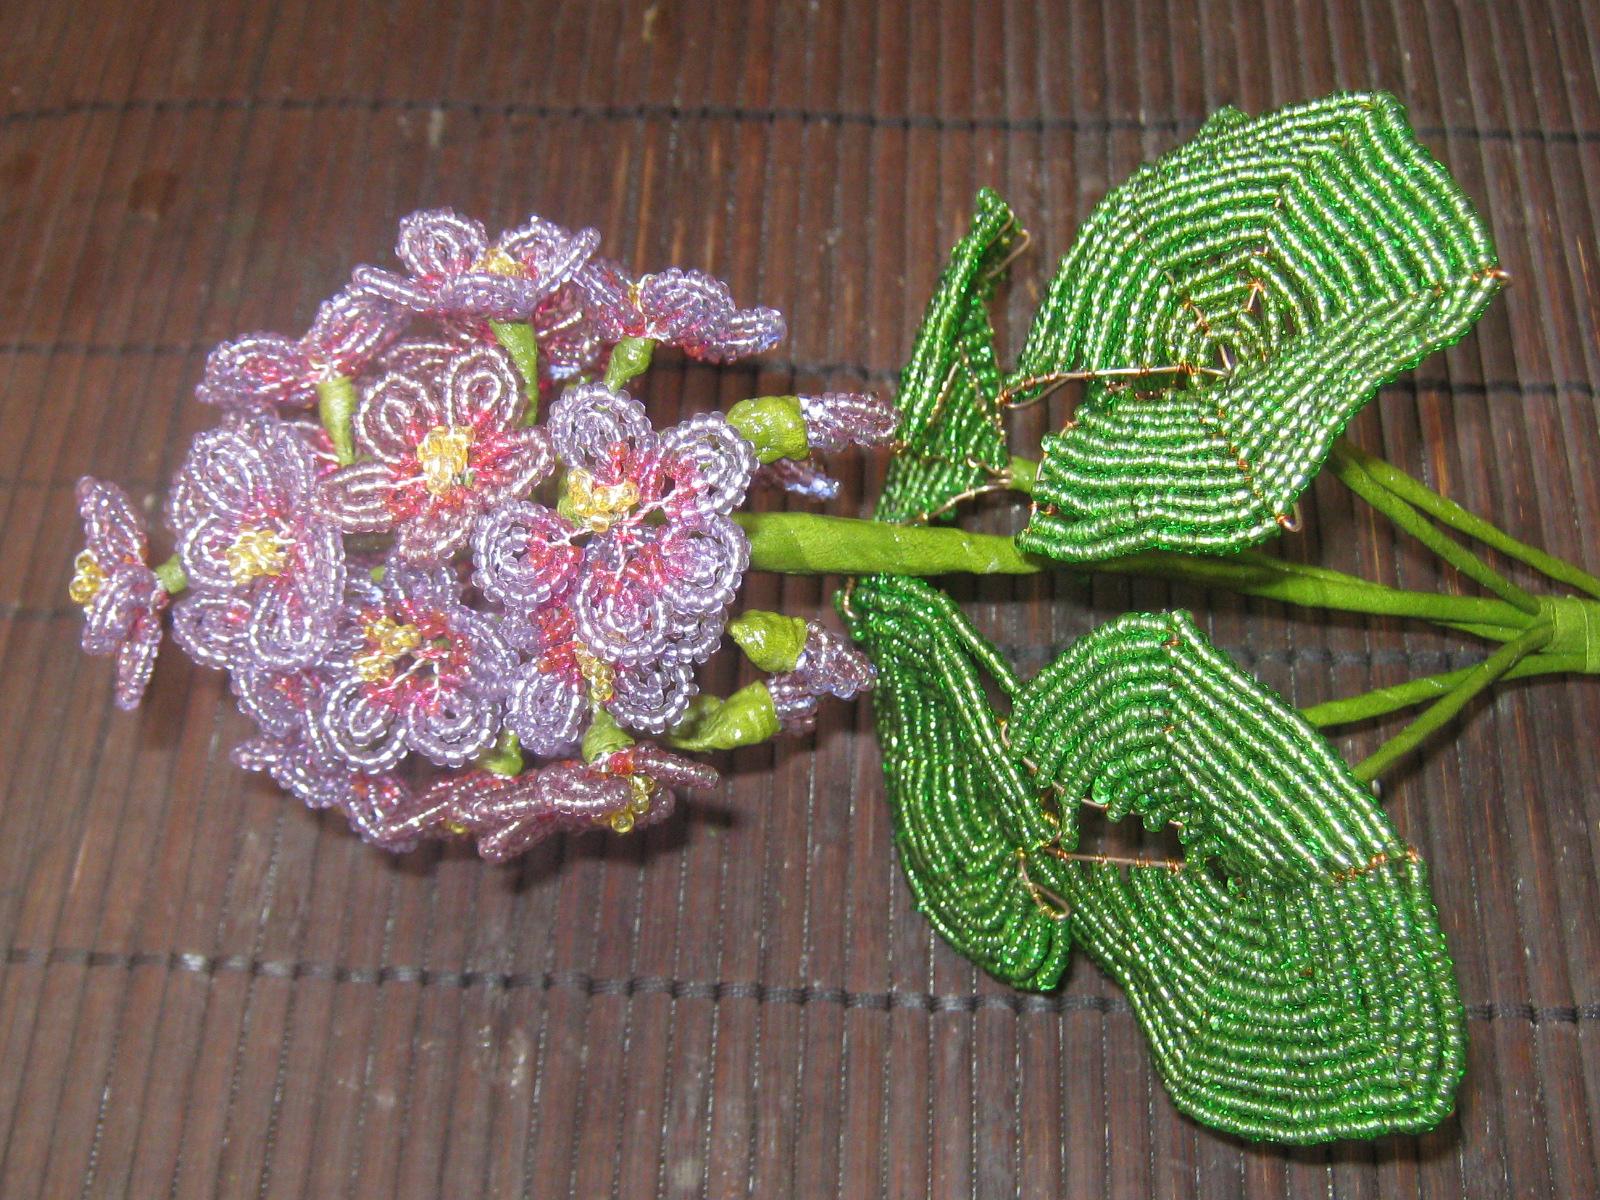 Flowers made of beads. .  Все о рукоделии: схемы, мастер классы, идеи на сайте labhousehold.com.